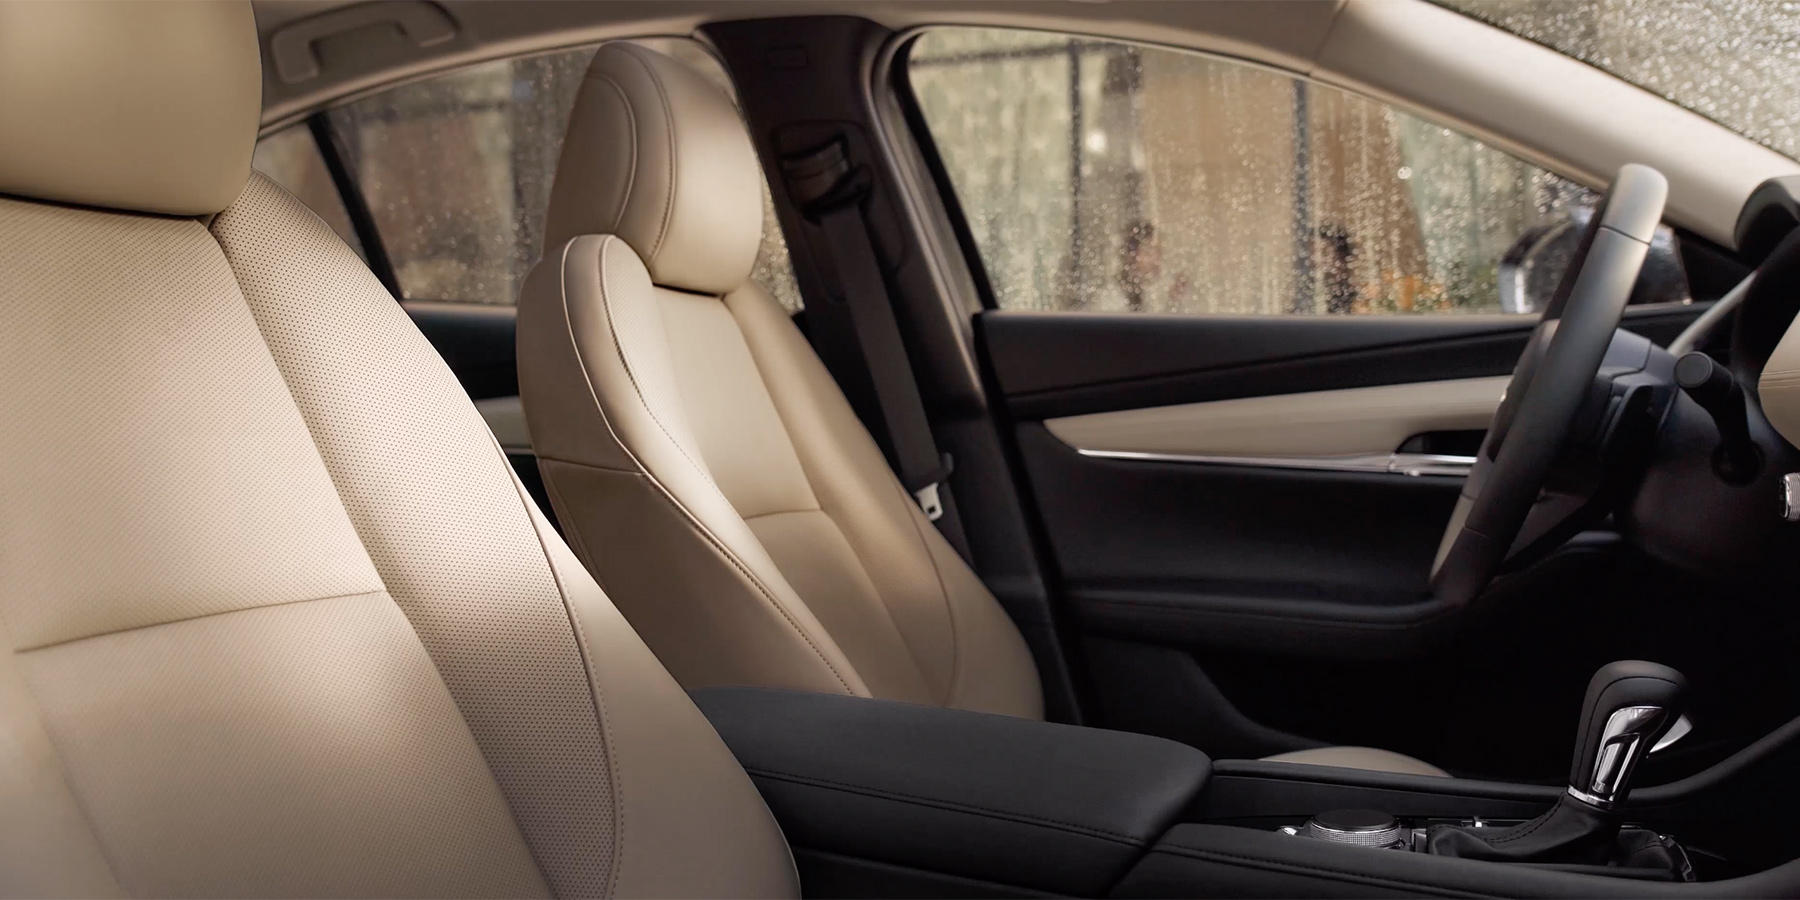 2020 MAZDA3 Sedan Front Seats